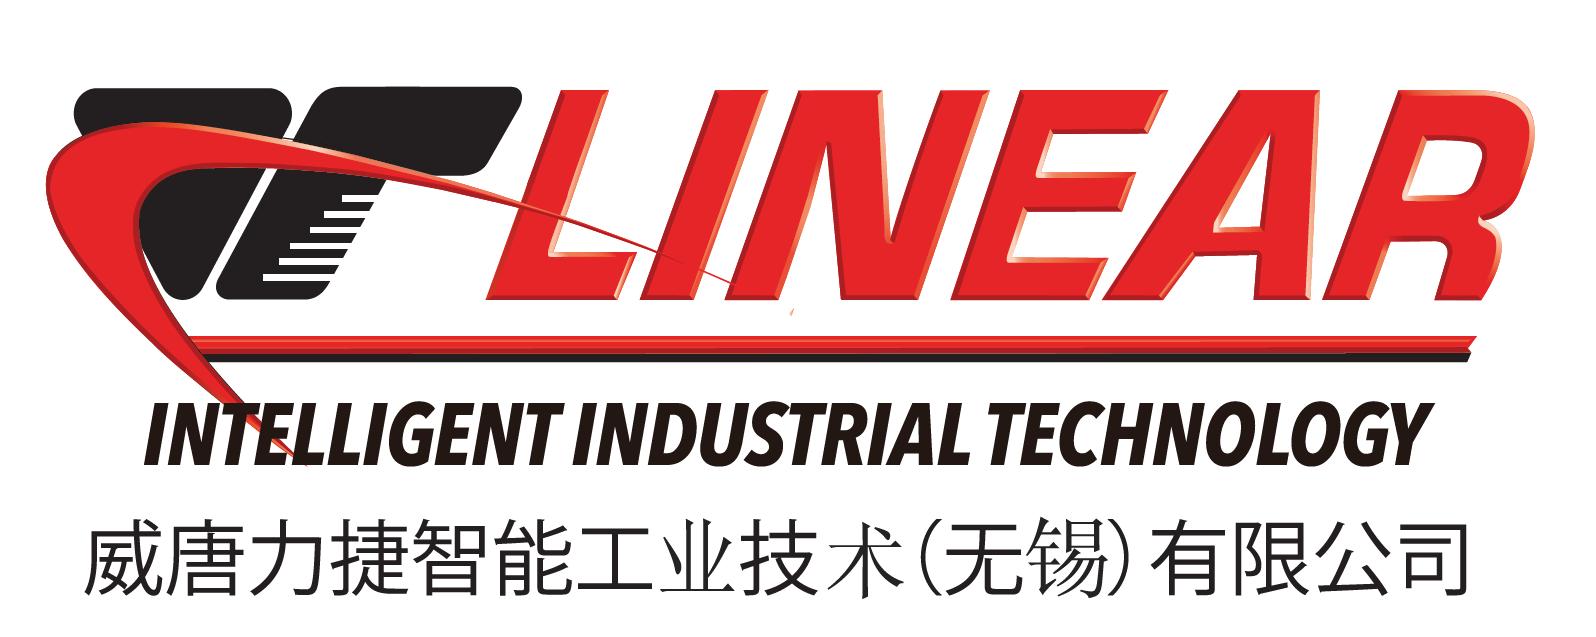 Linear Intelligent Industrial Technology